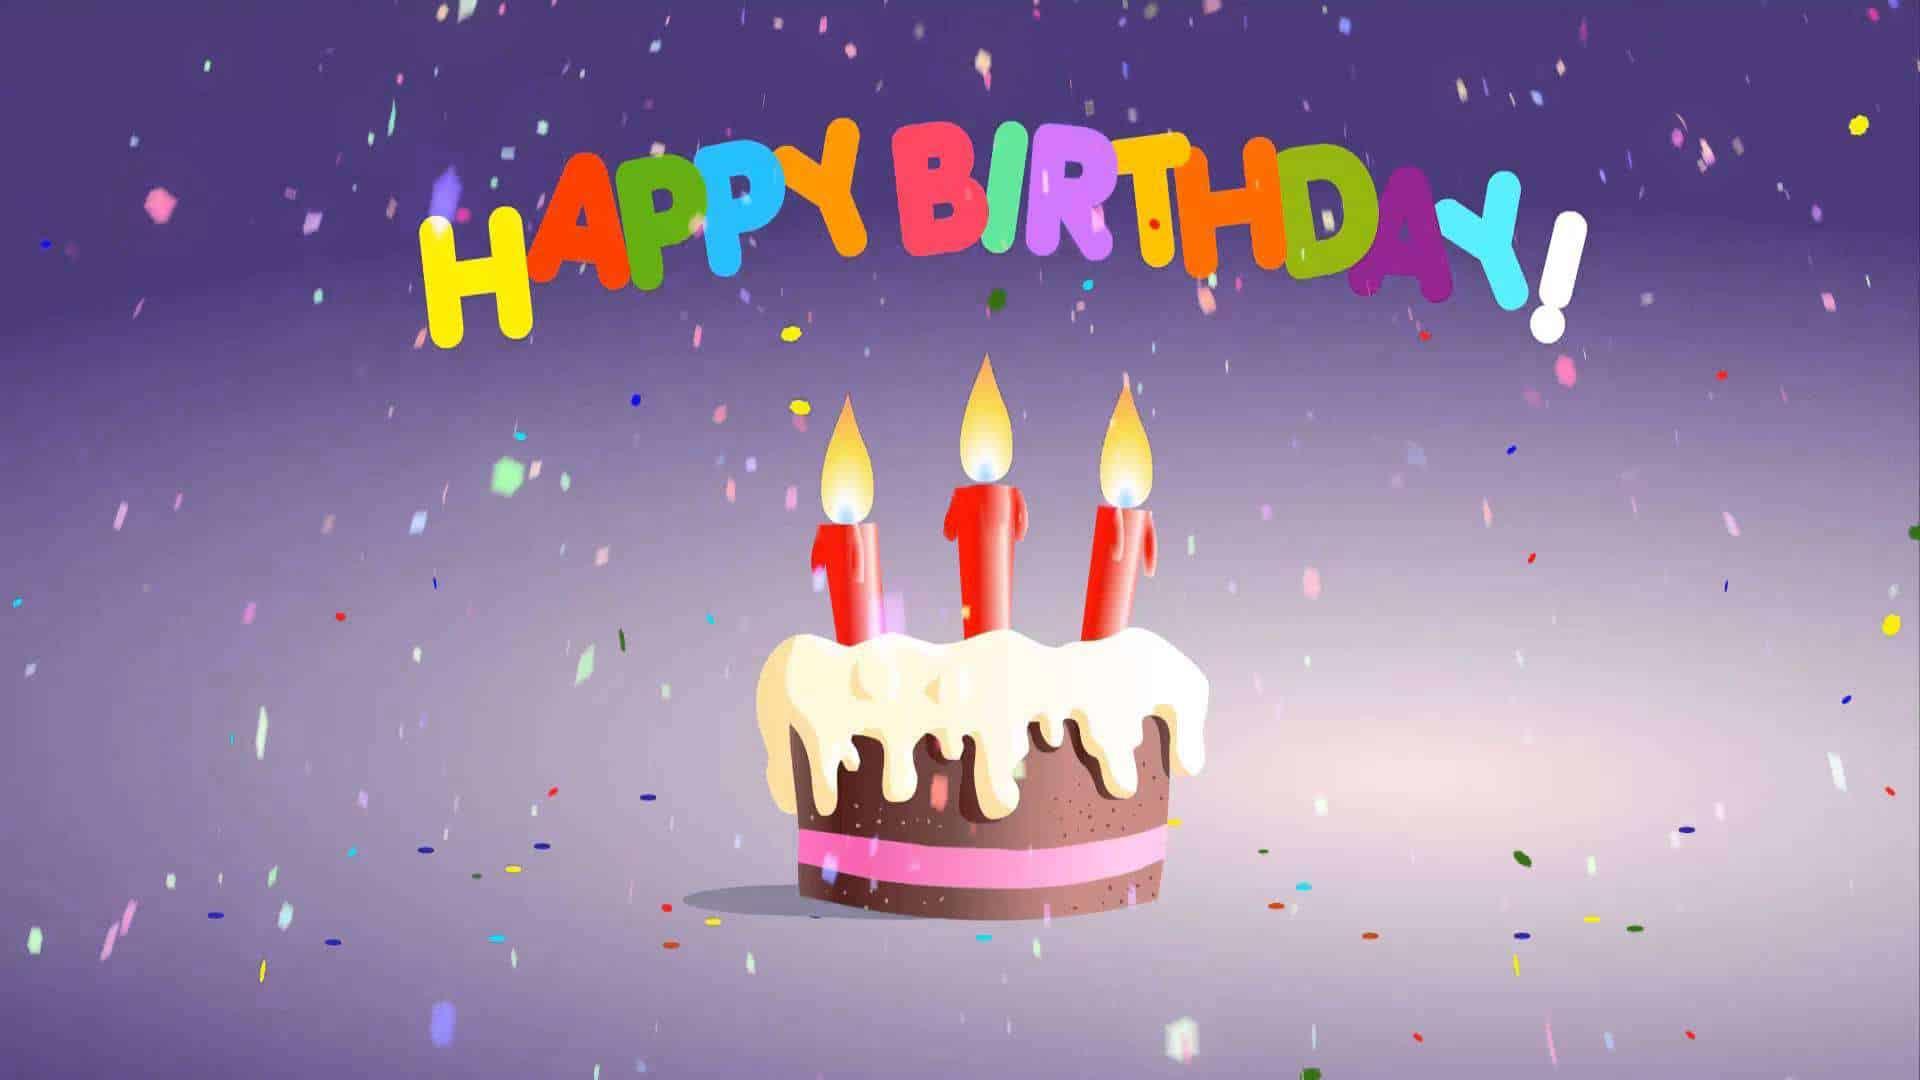 Happy birthday cards happy birthday to you happy birthday wishes happy birthday cards m4hsunfo